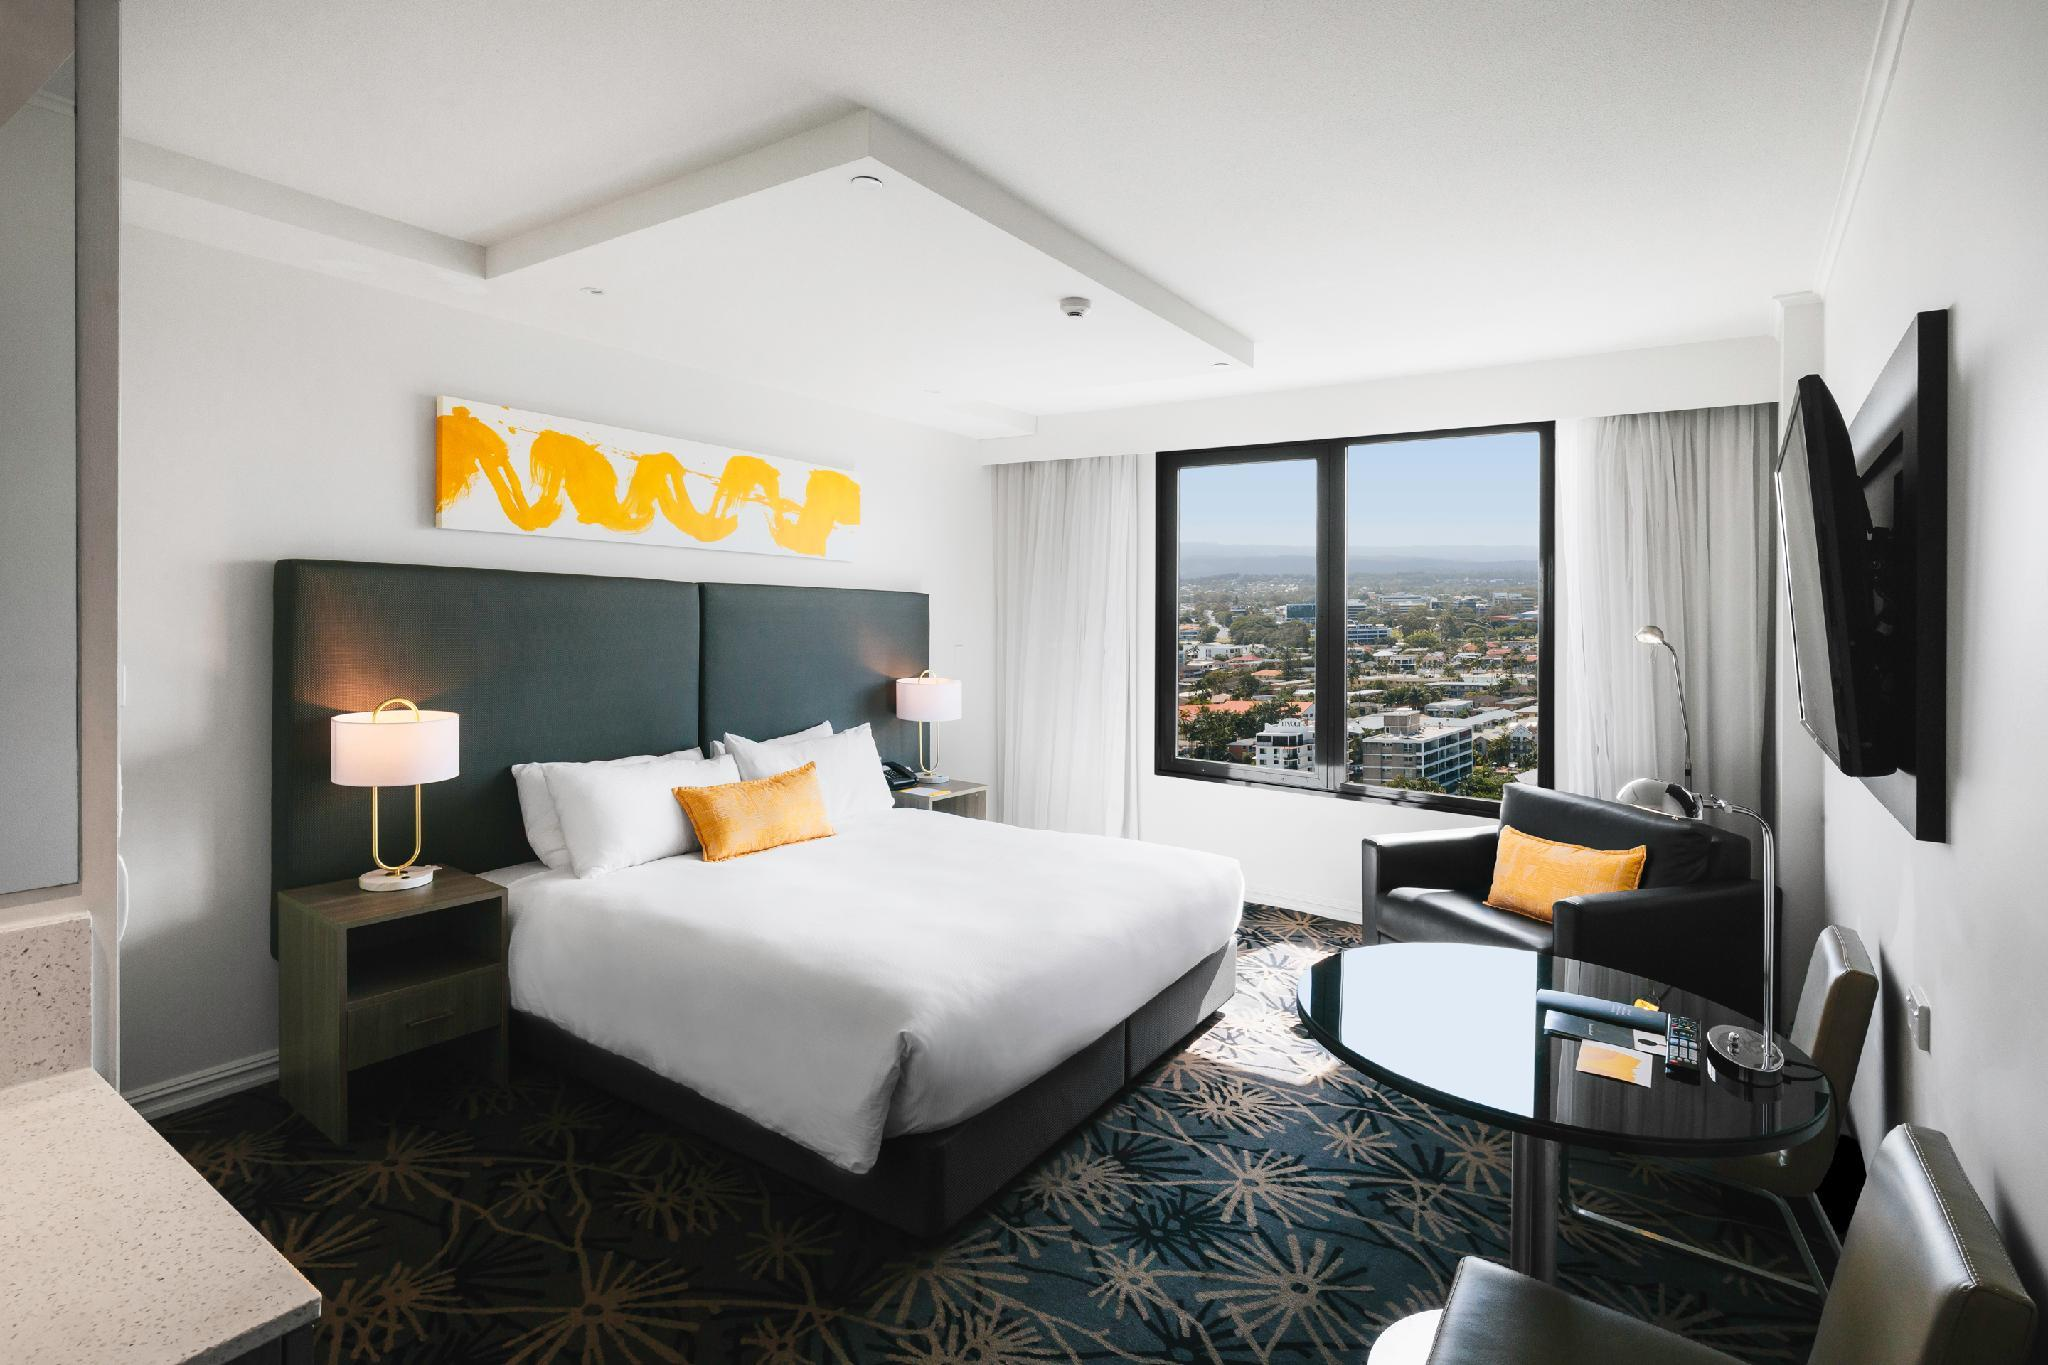 Book voco Gold Coast (formerly Watermark Hotel & Spa) - An